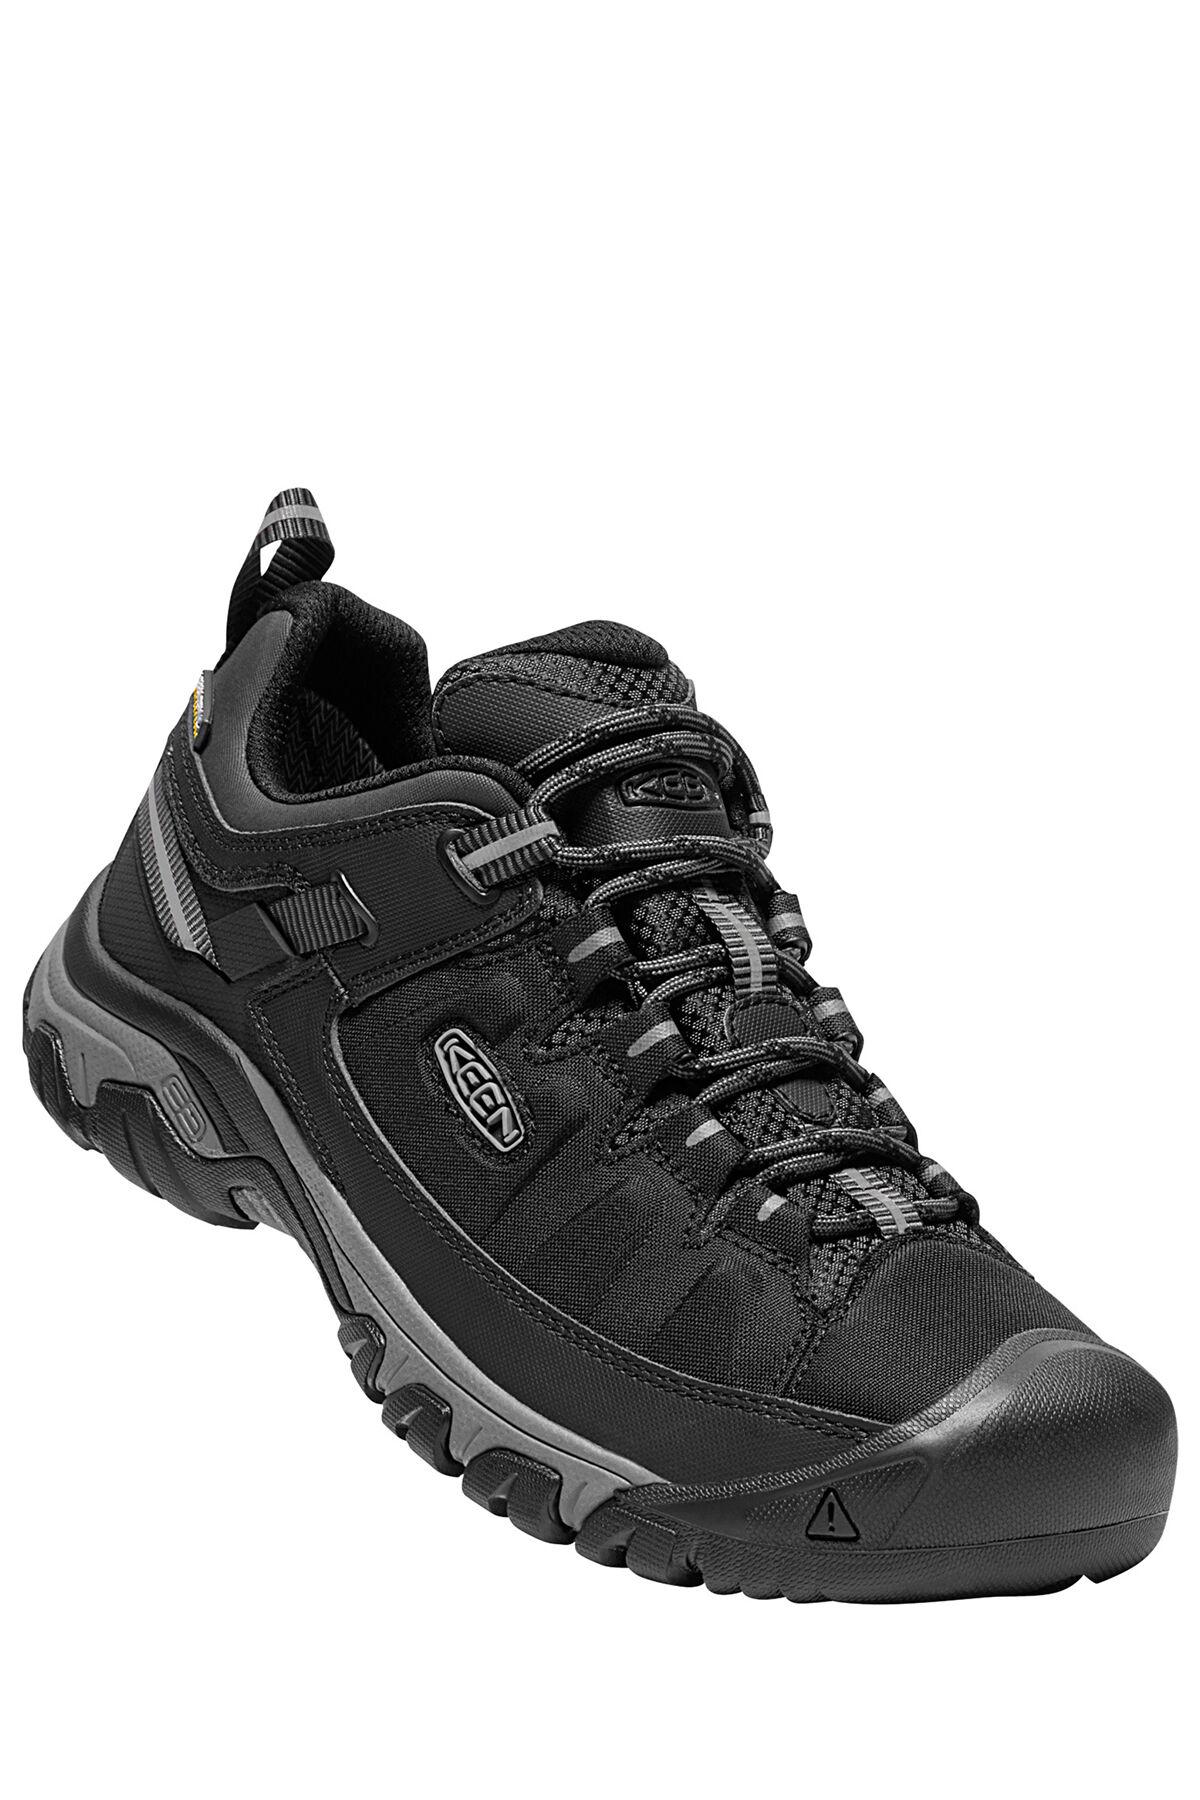 keen targhee exp walking shoes